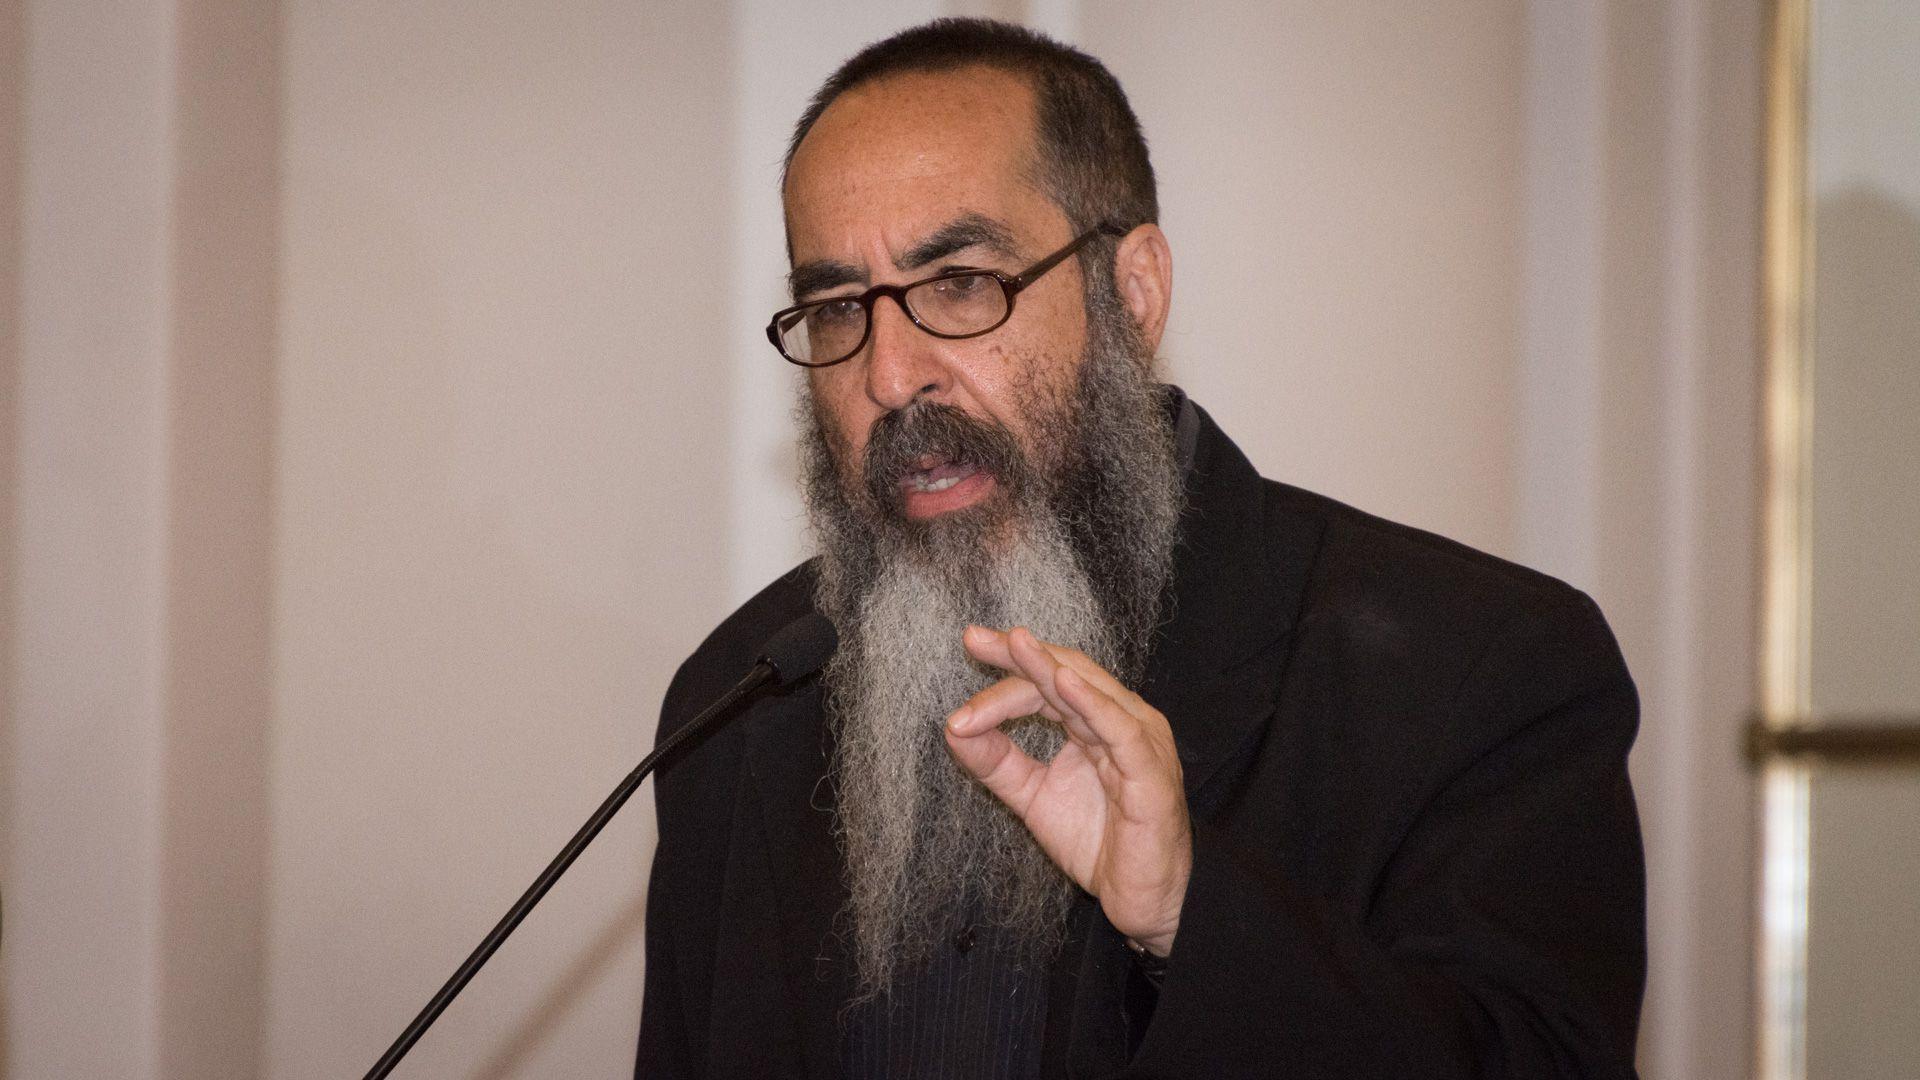 El rabino Daniel Goldman, vicepresidente segundo del Instituto de Diálogo Interreligioso